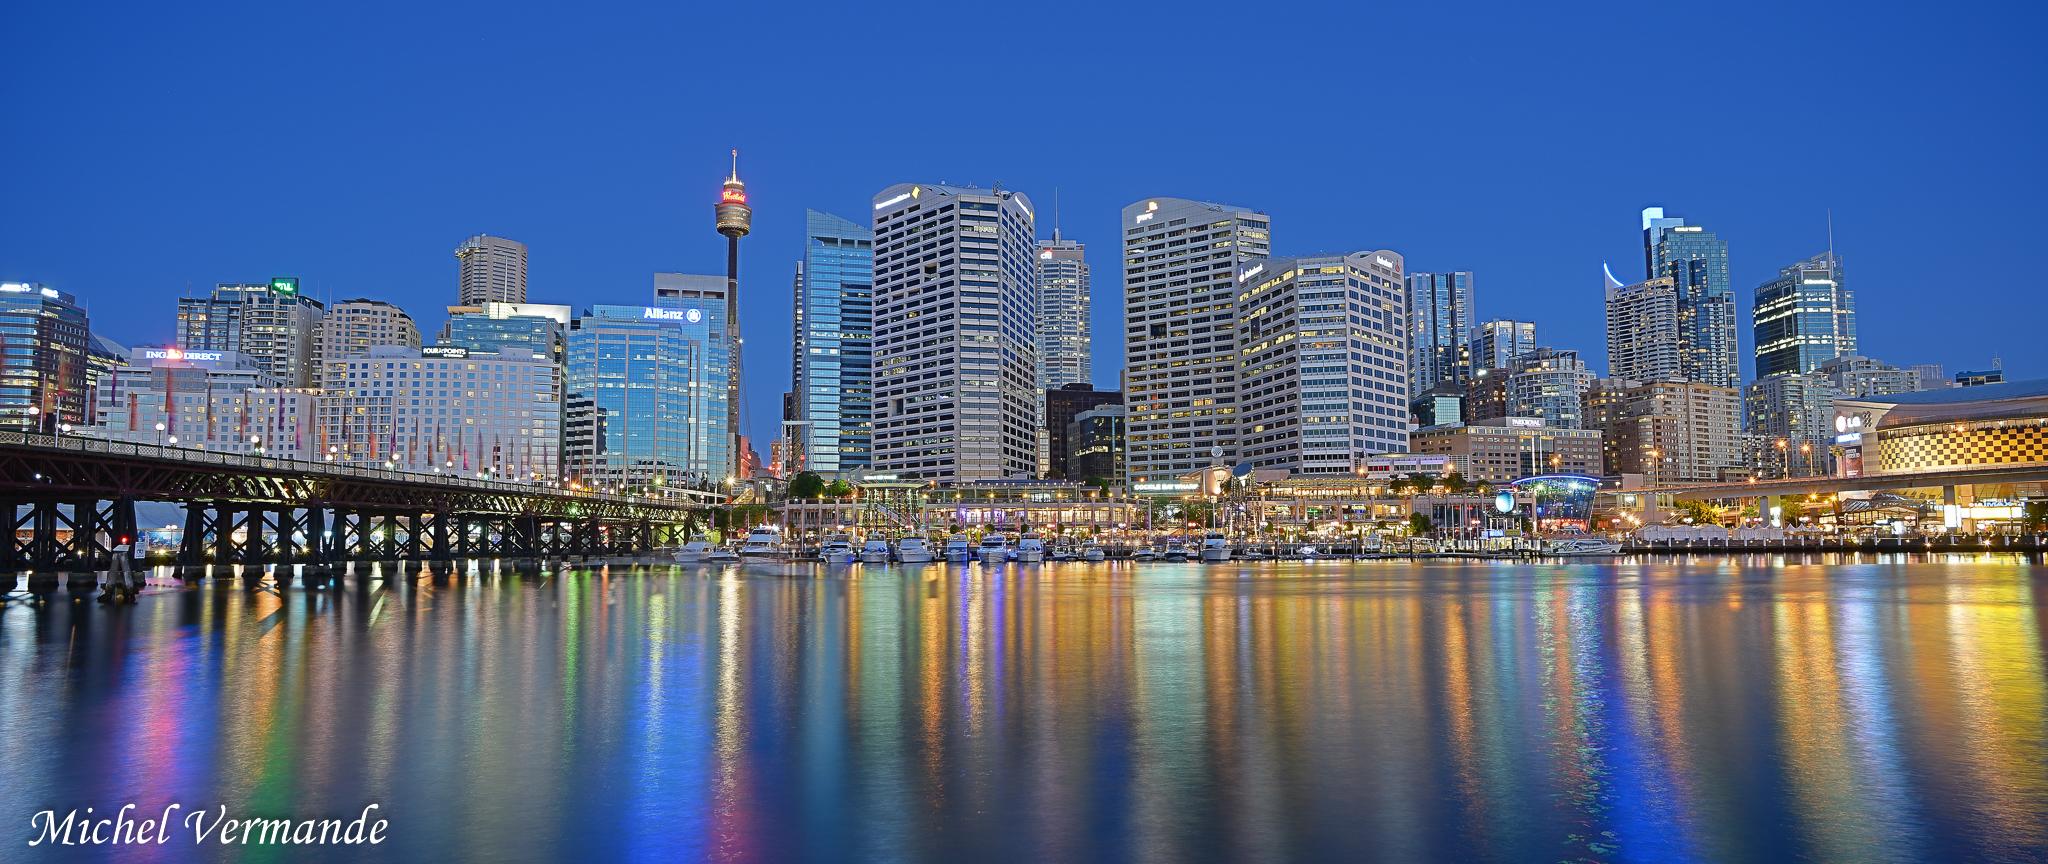 Darling Harbour, Australia